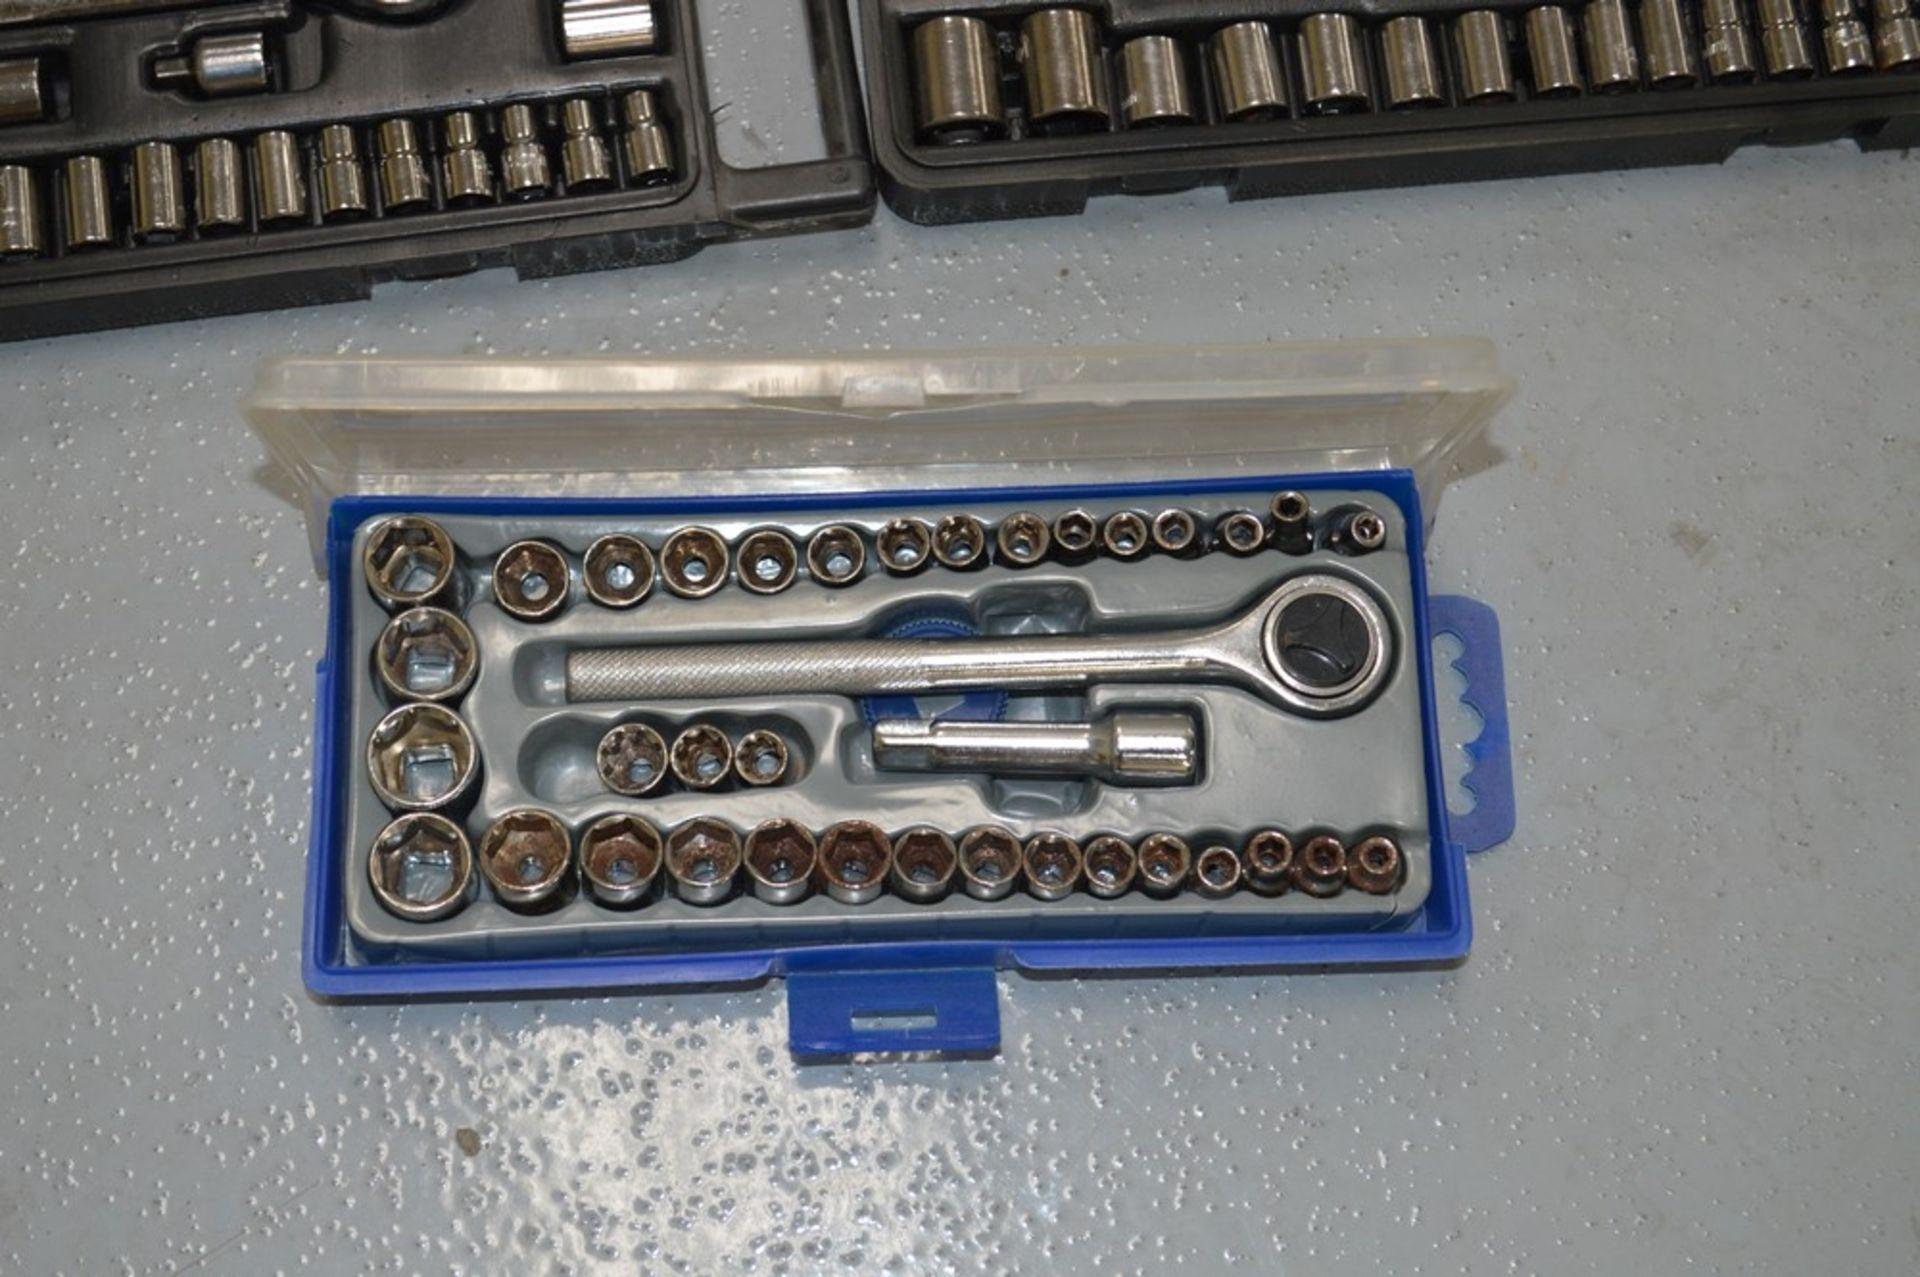 (2) SPE + metric 40 piece forged steel socket sets, (1) misc socket set - Image 3 of 3